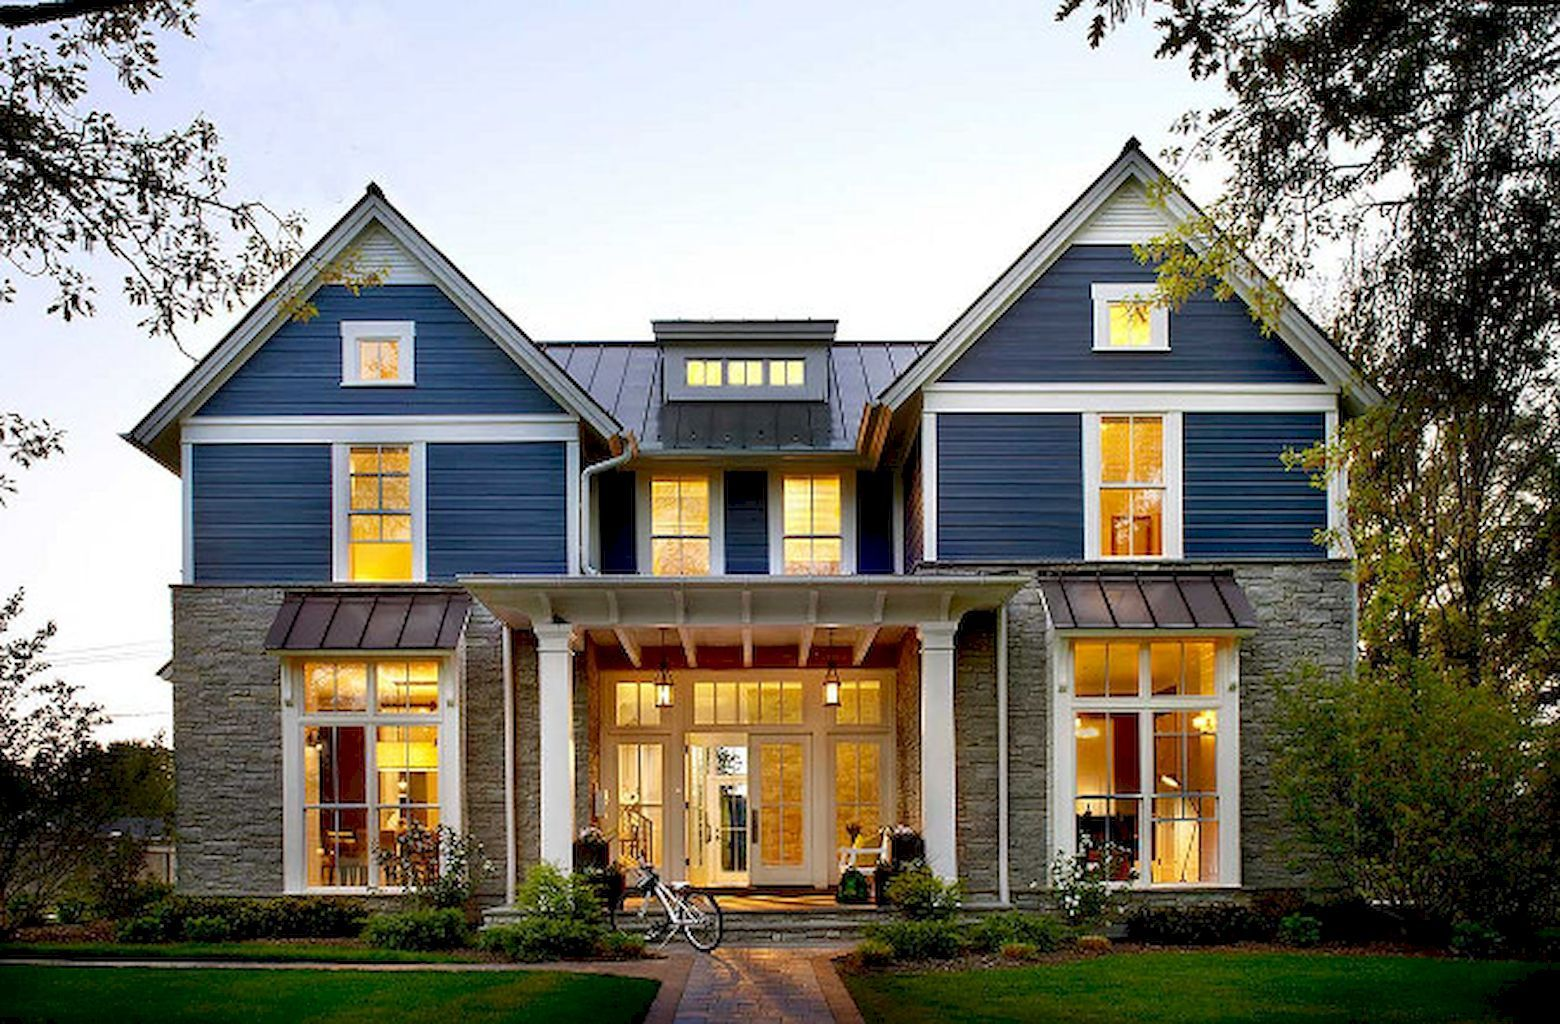 75 aesthetic farmhouse exterior design ideas | exterior design and